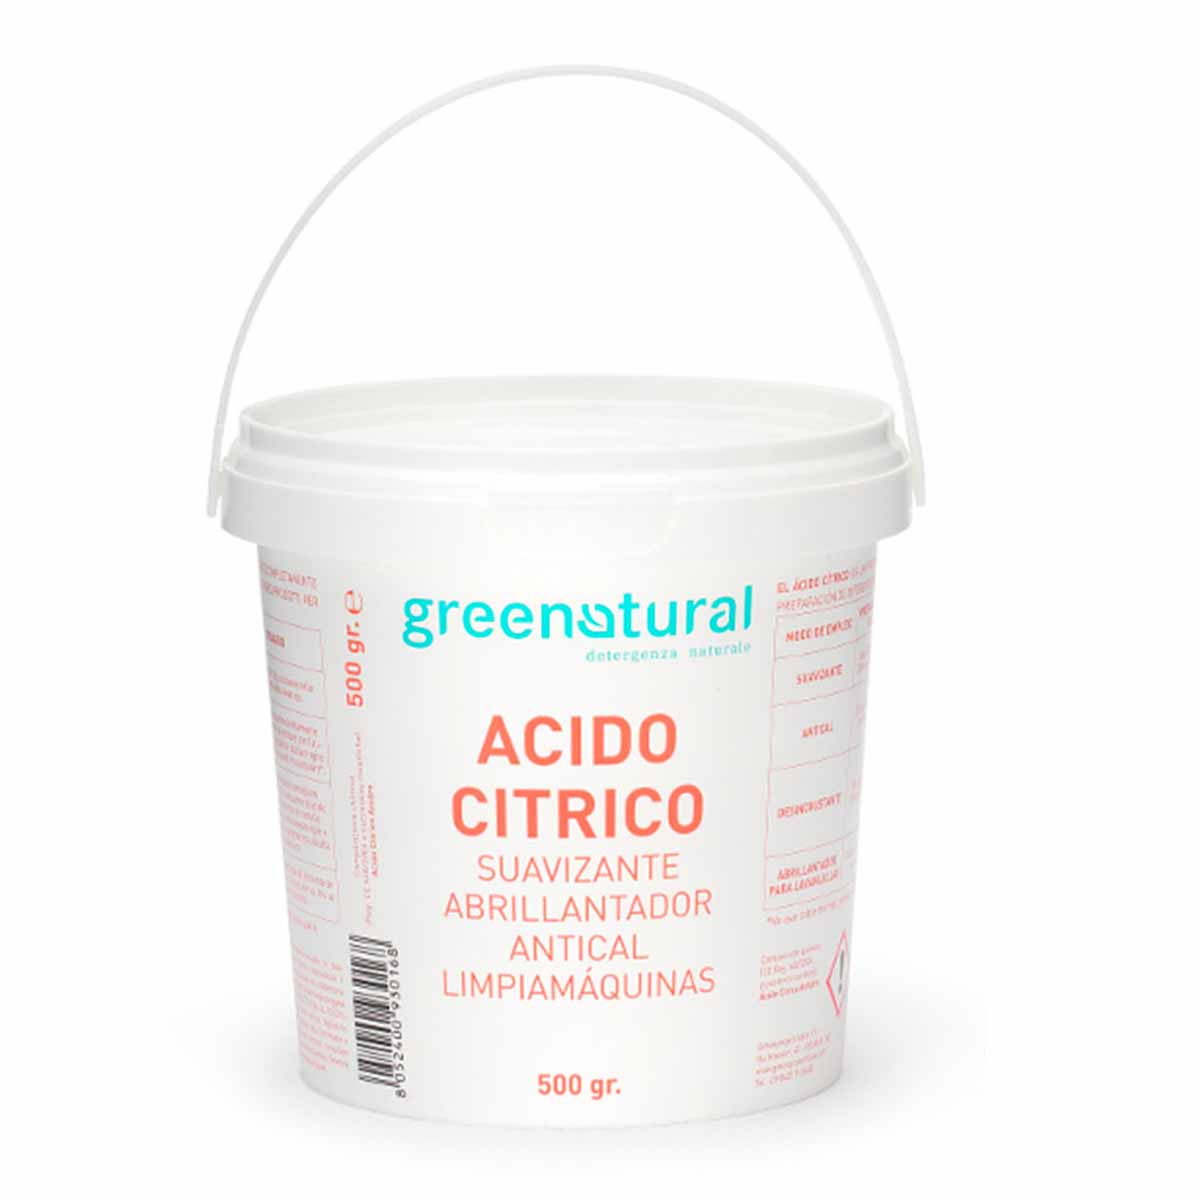 Greenatural – Acido Citrico 500g